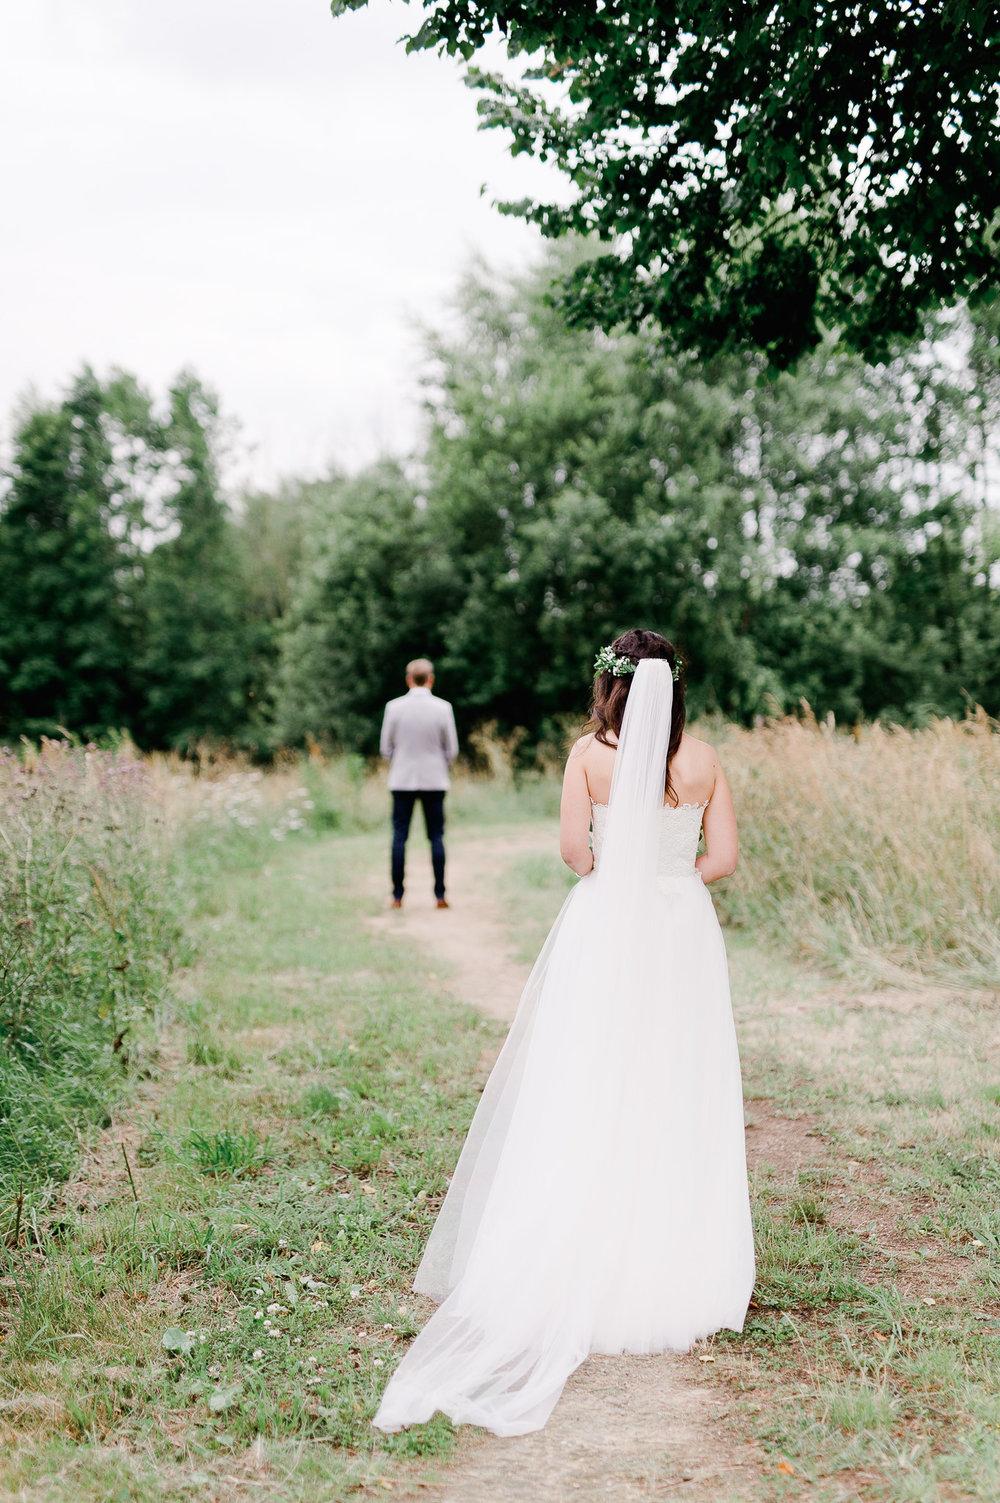 Anna_Hari_Wedding_Photography-36.jpg